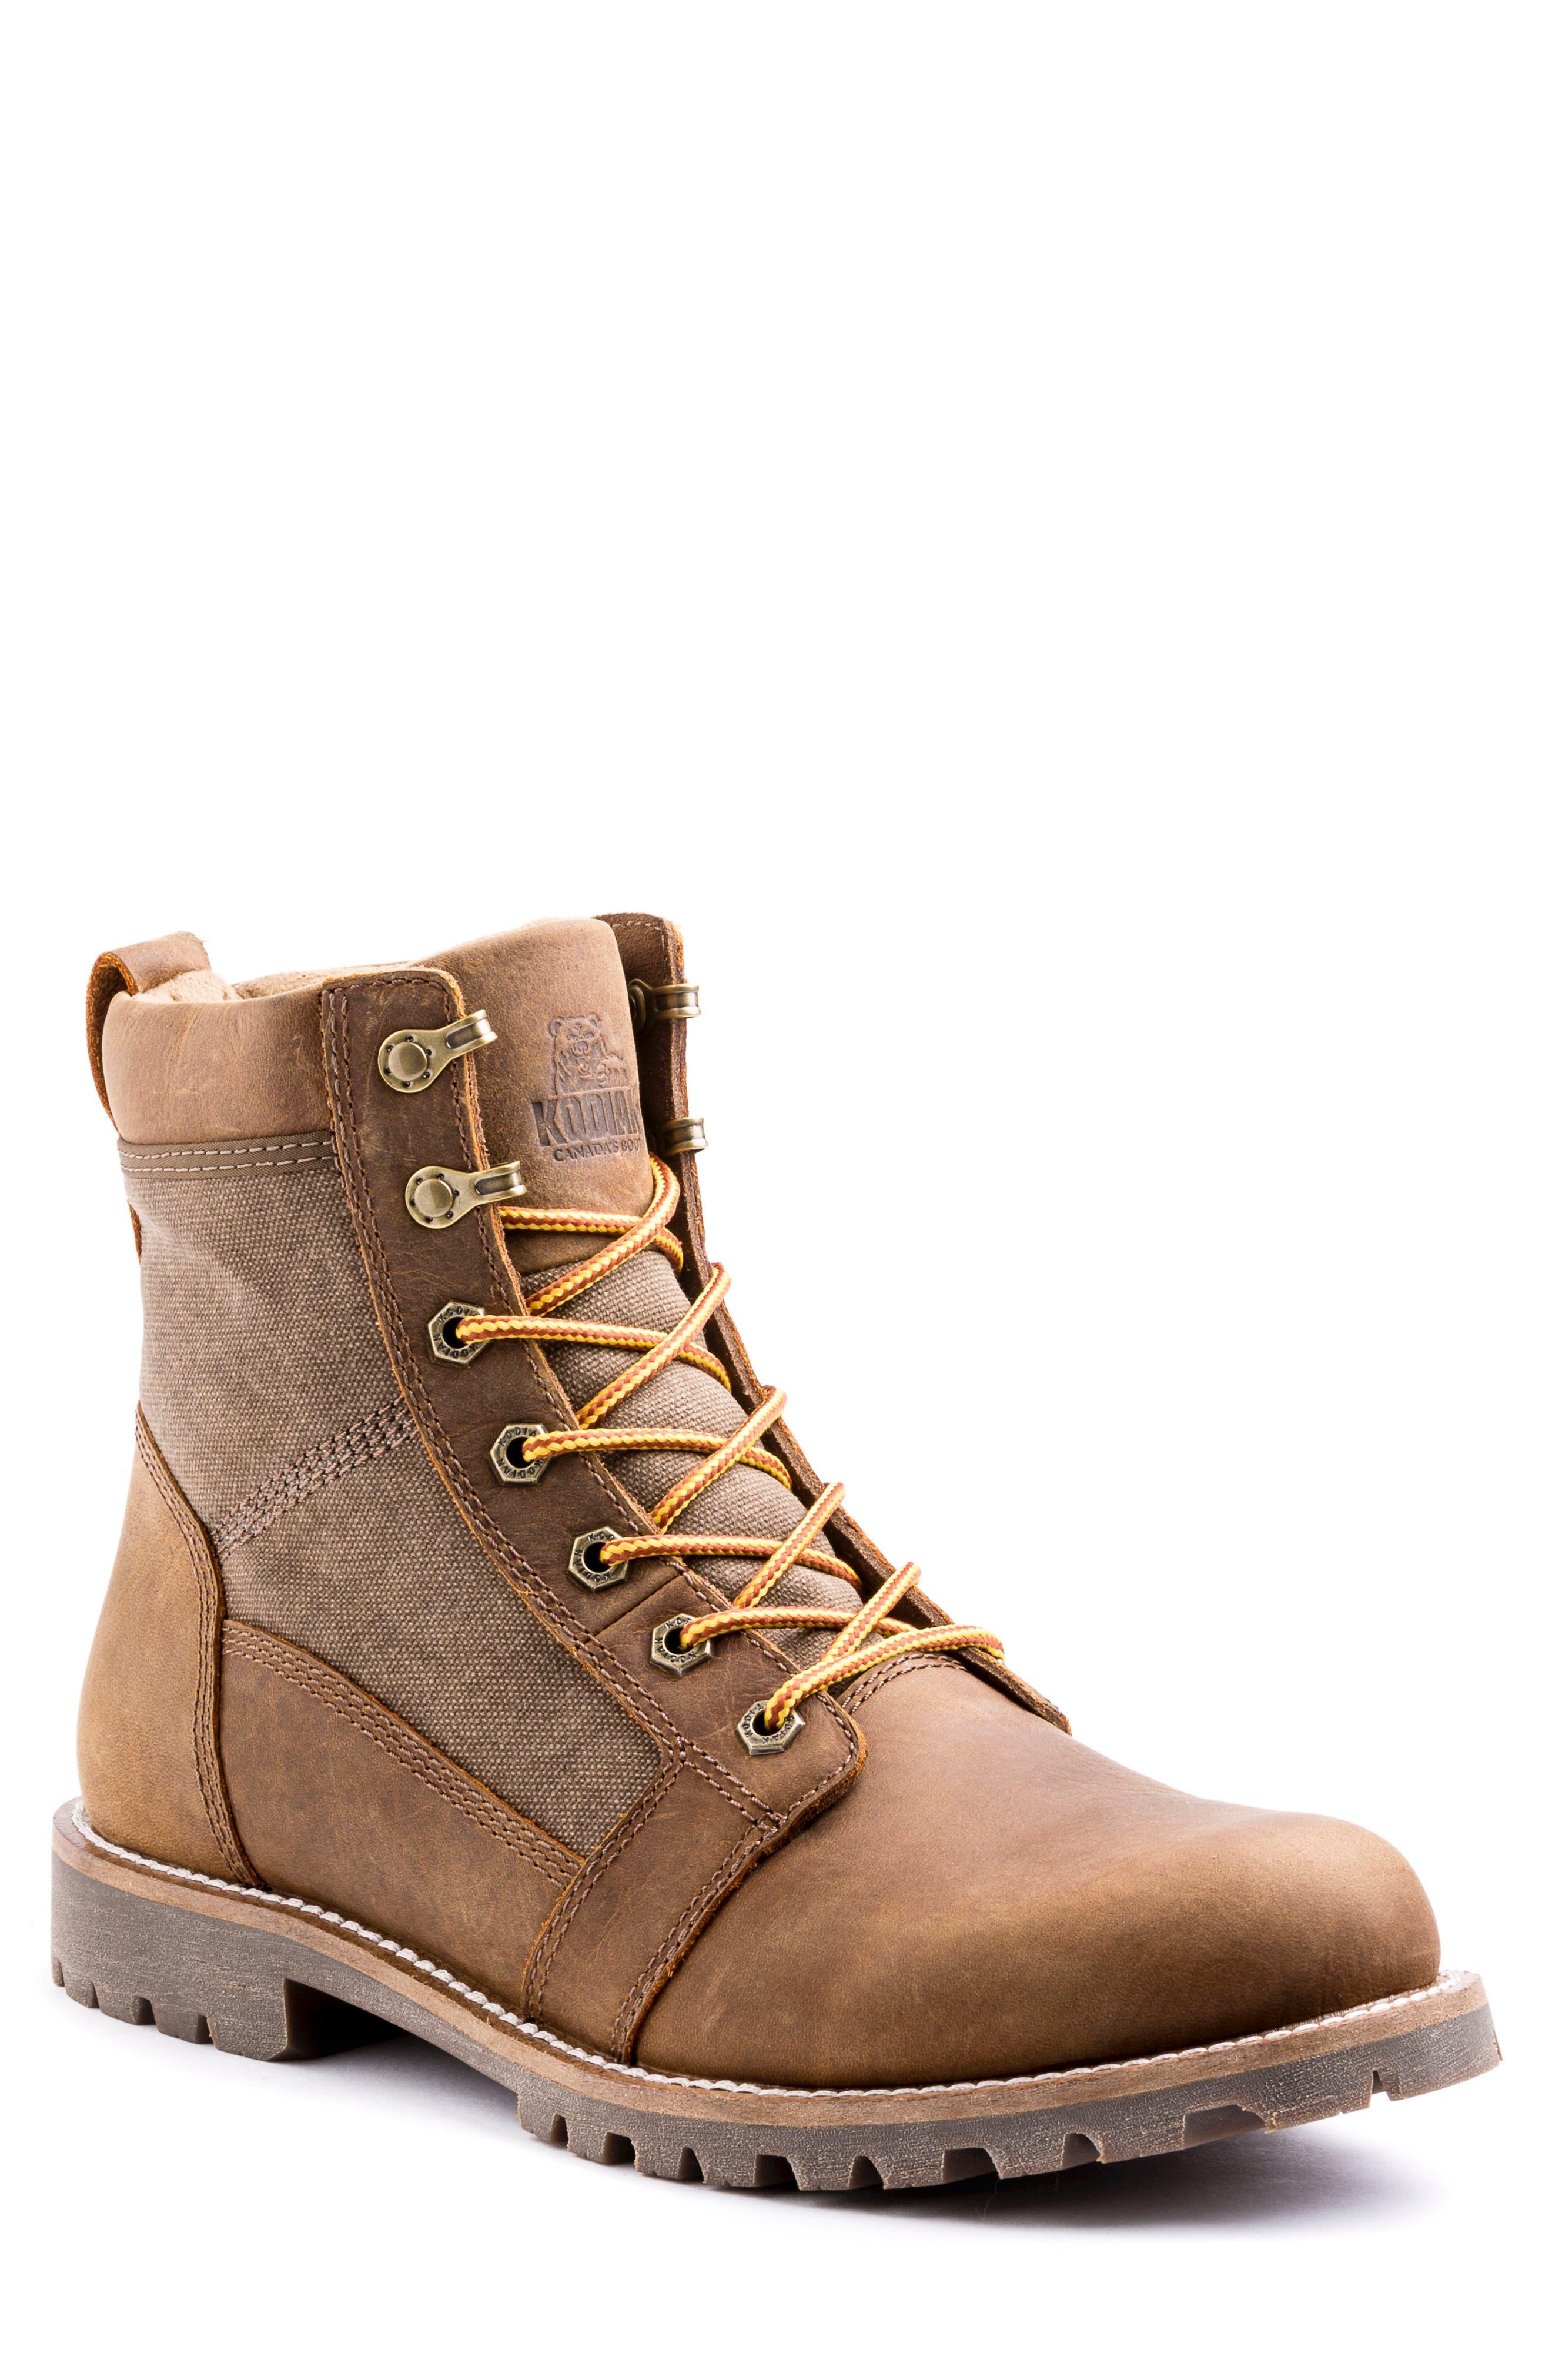 Thane Waterproof Boot